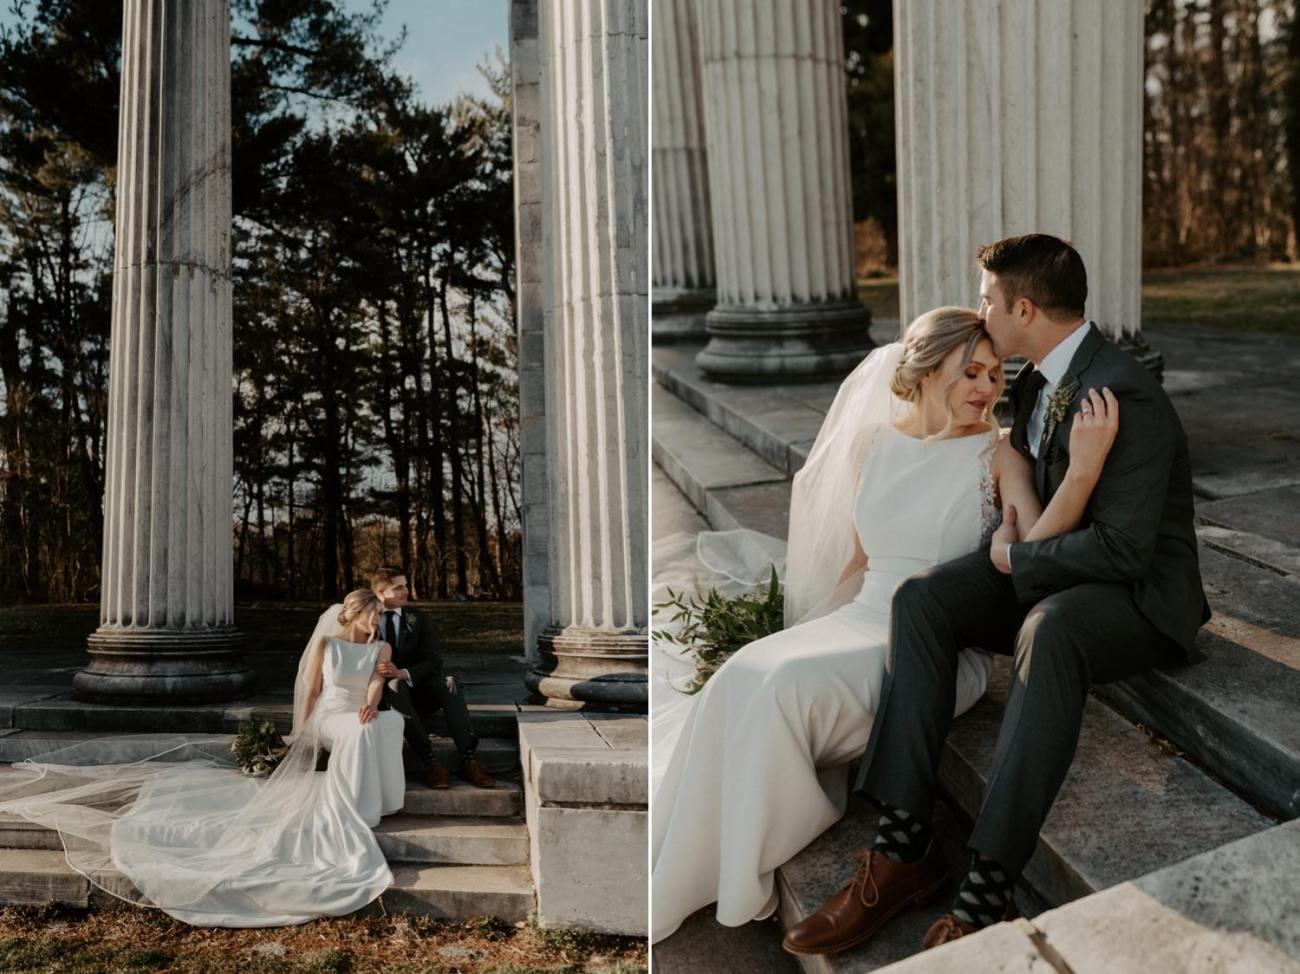 Princeton Battlefield Wedding Princeton University Elopement New Jersey Wedding Photographer Anais Possamai Photography 29